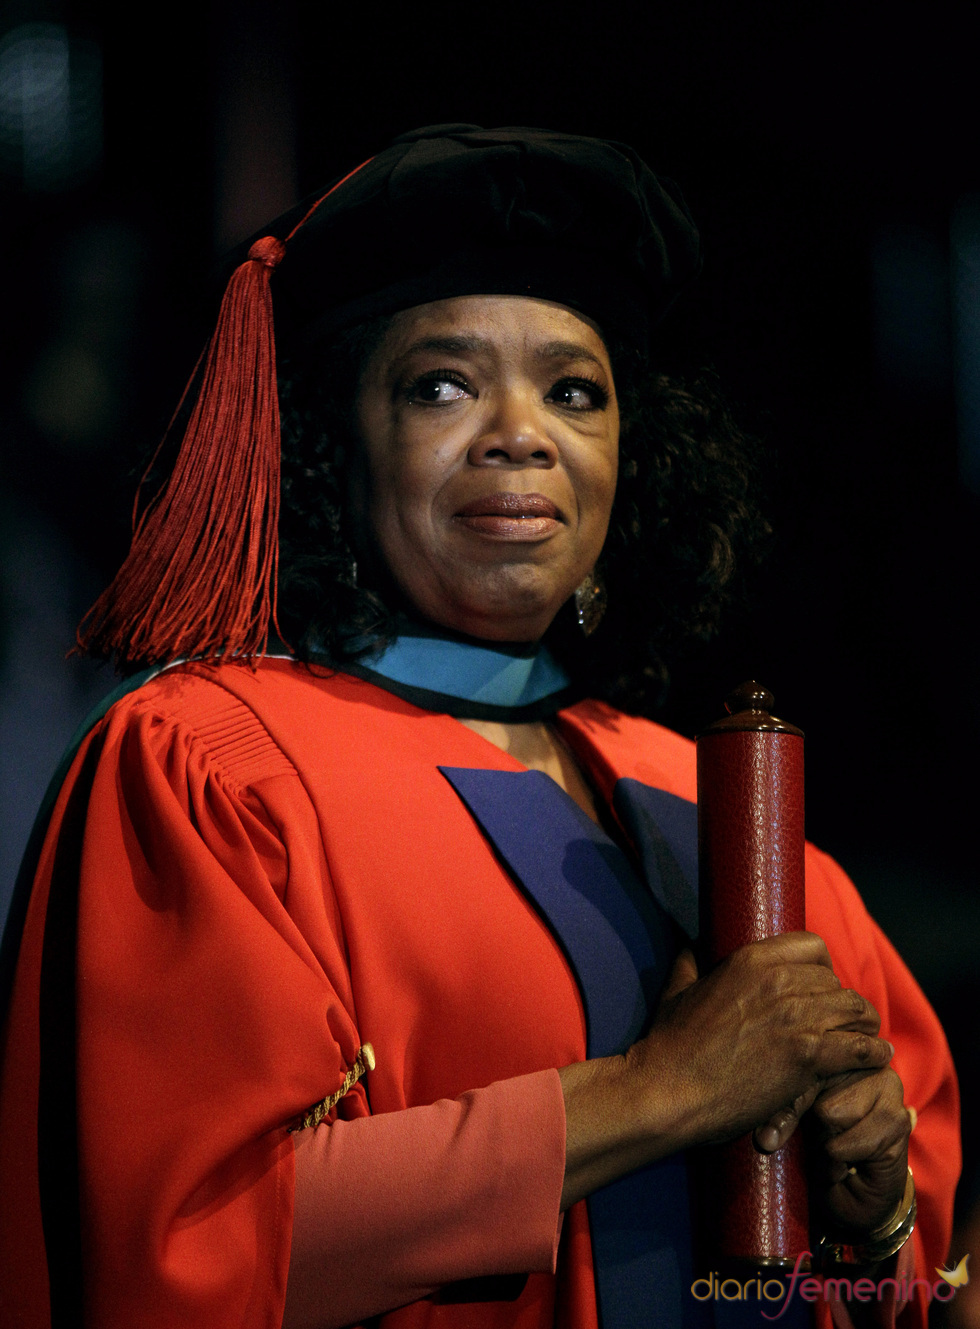 Oprah Winfrey recibe su doctorado honoris causa en Sudáfrica